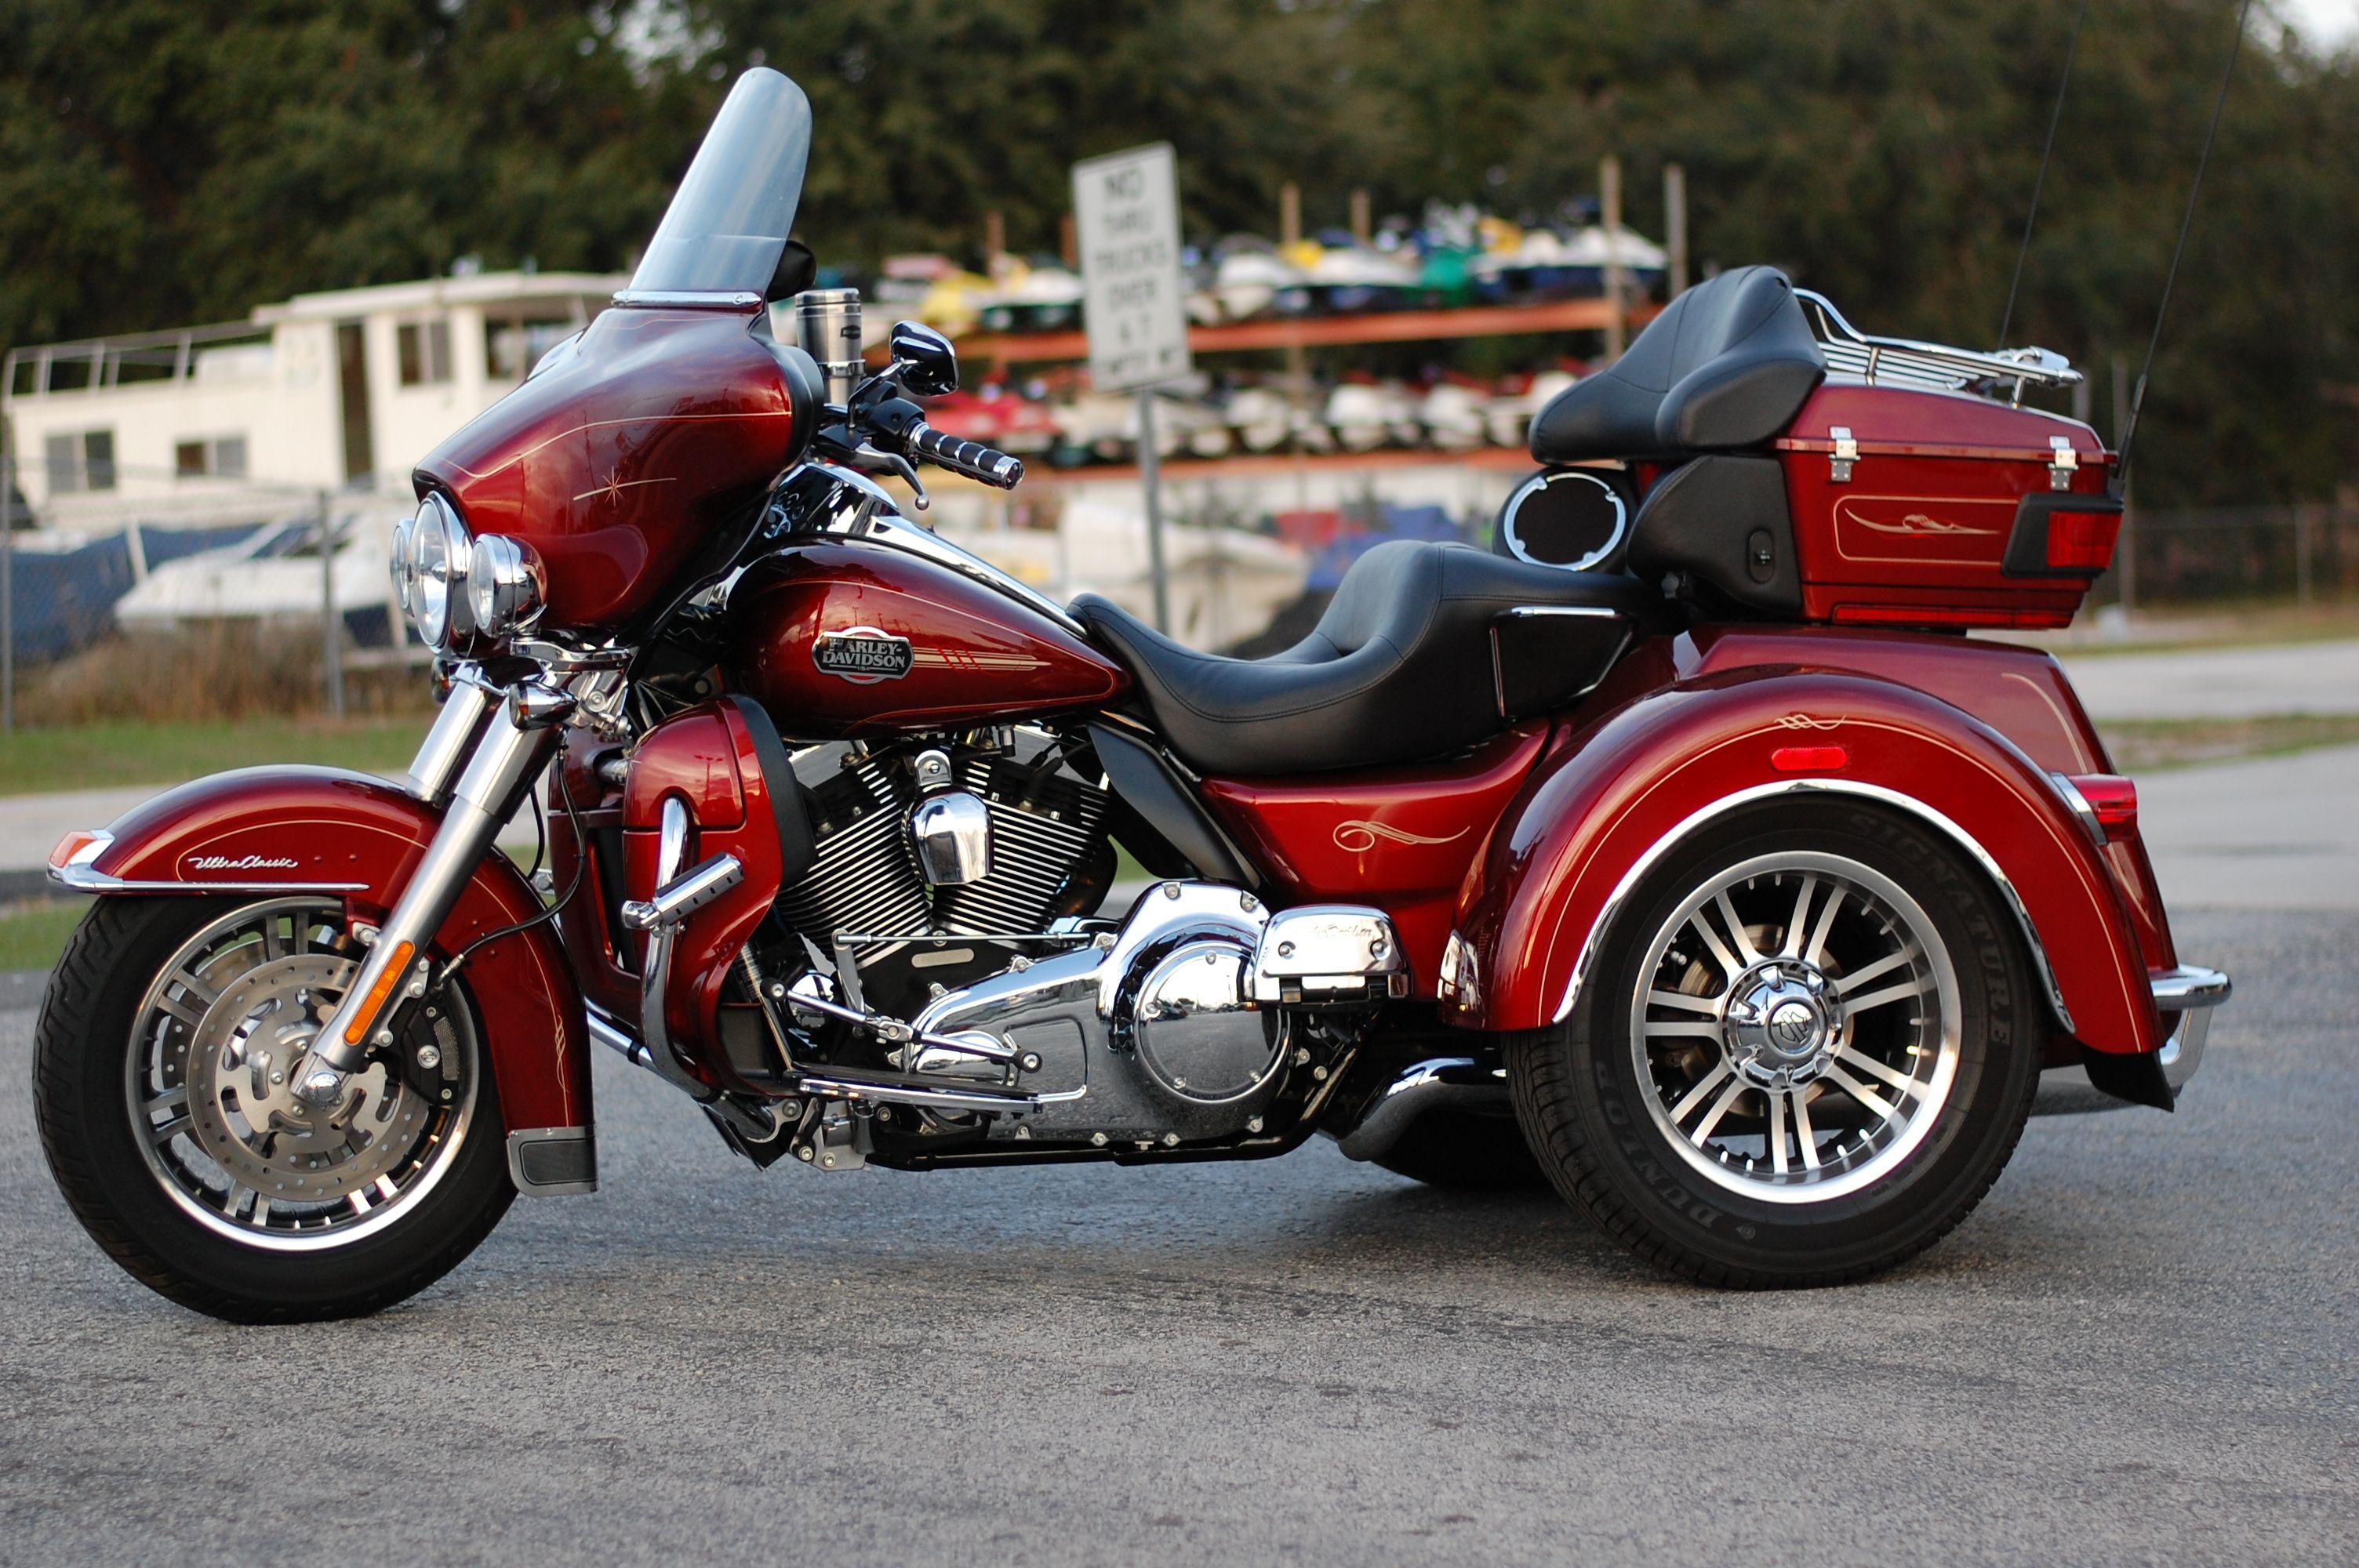 Harley Davidson Tri Glide Harley Davidson Trike Harley Davidson Bikes Harley Davidson Merchandise